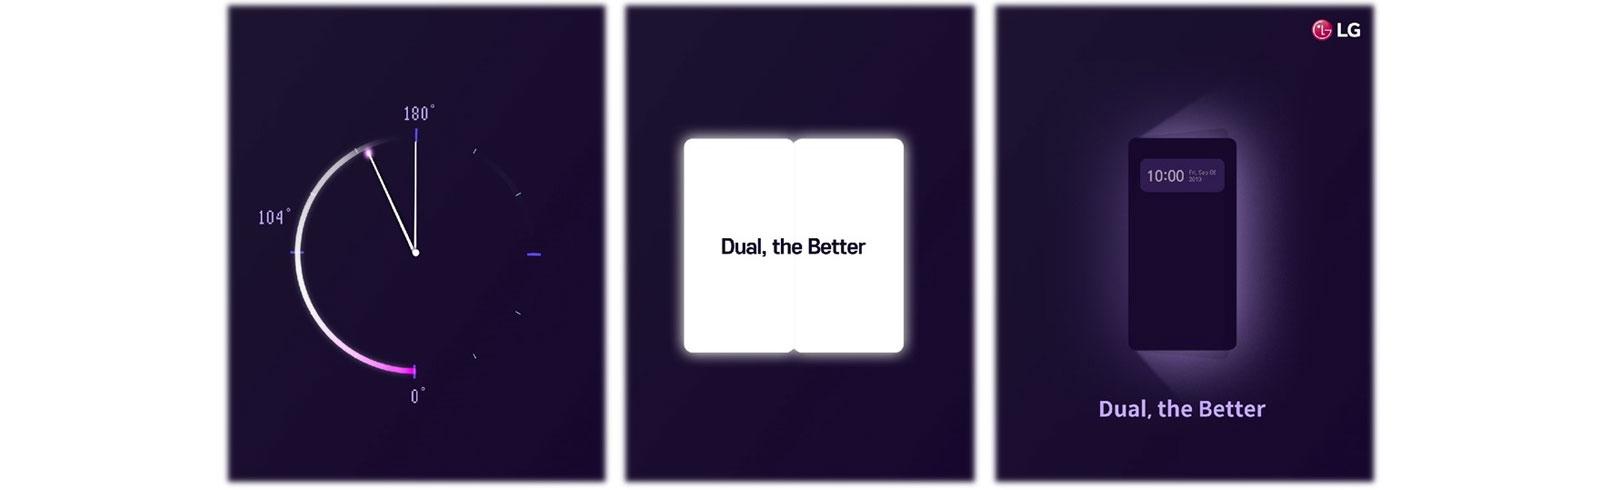 LG teases again the LG Dual Screen